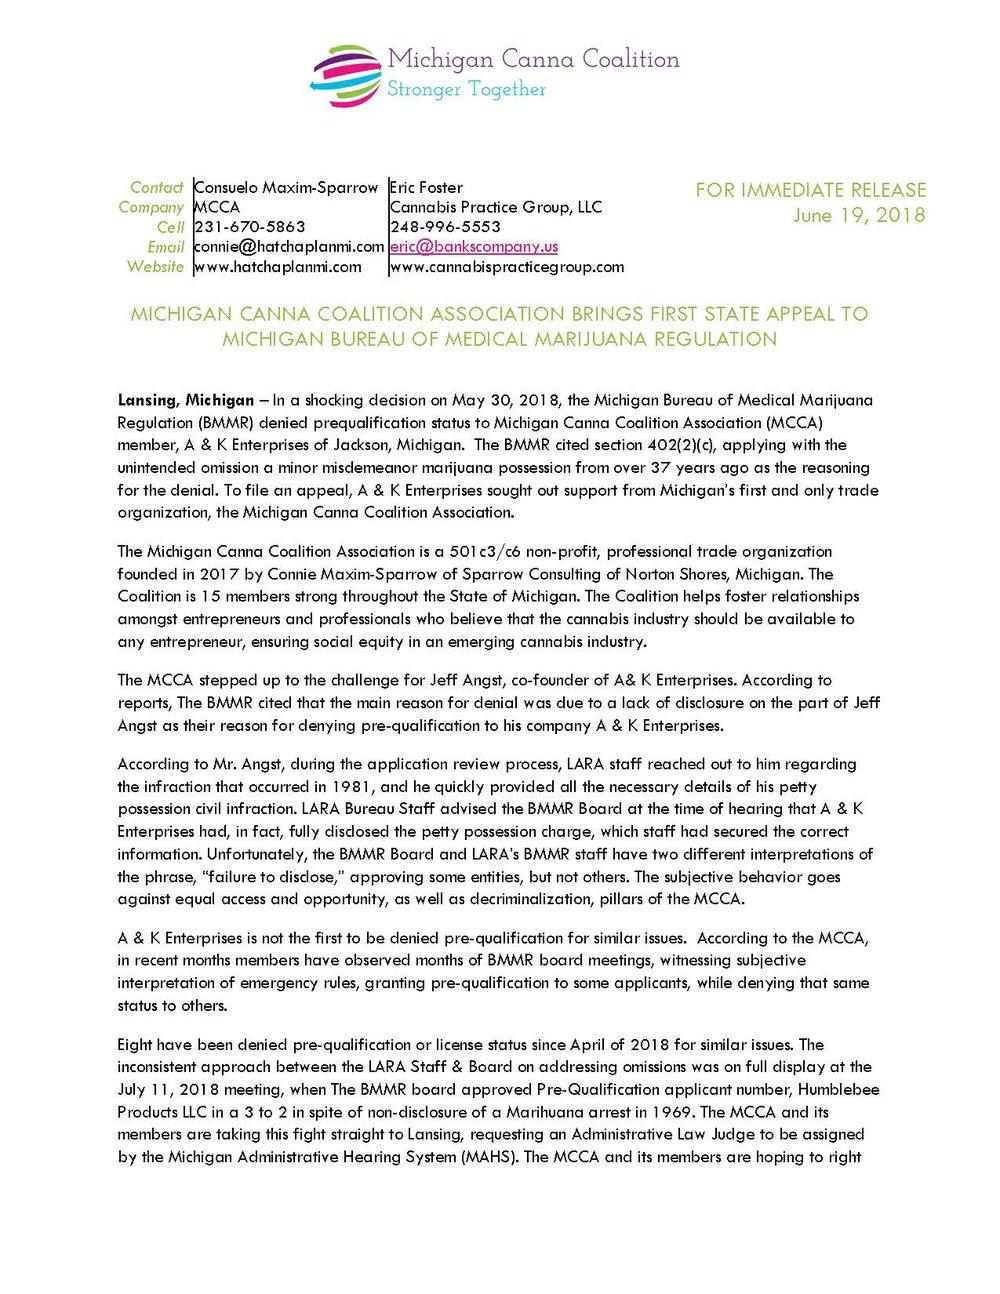 MCCA A and K Enterprises Press Release FINAL v.4_Page_1.jpg